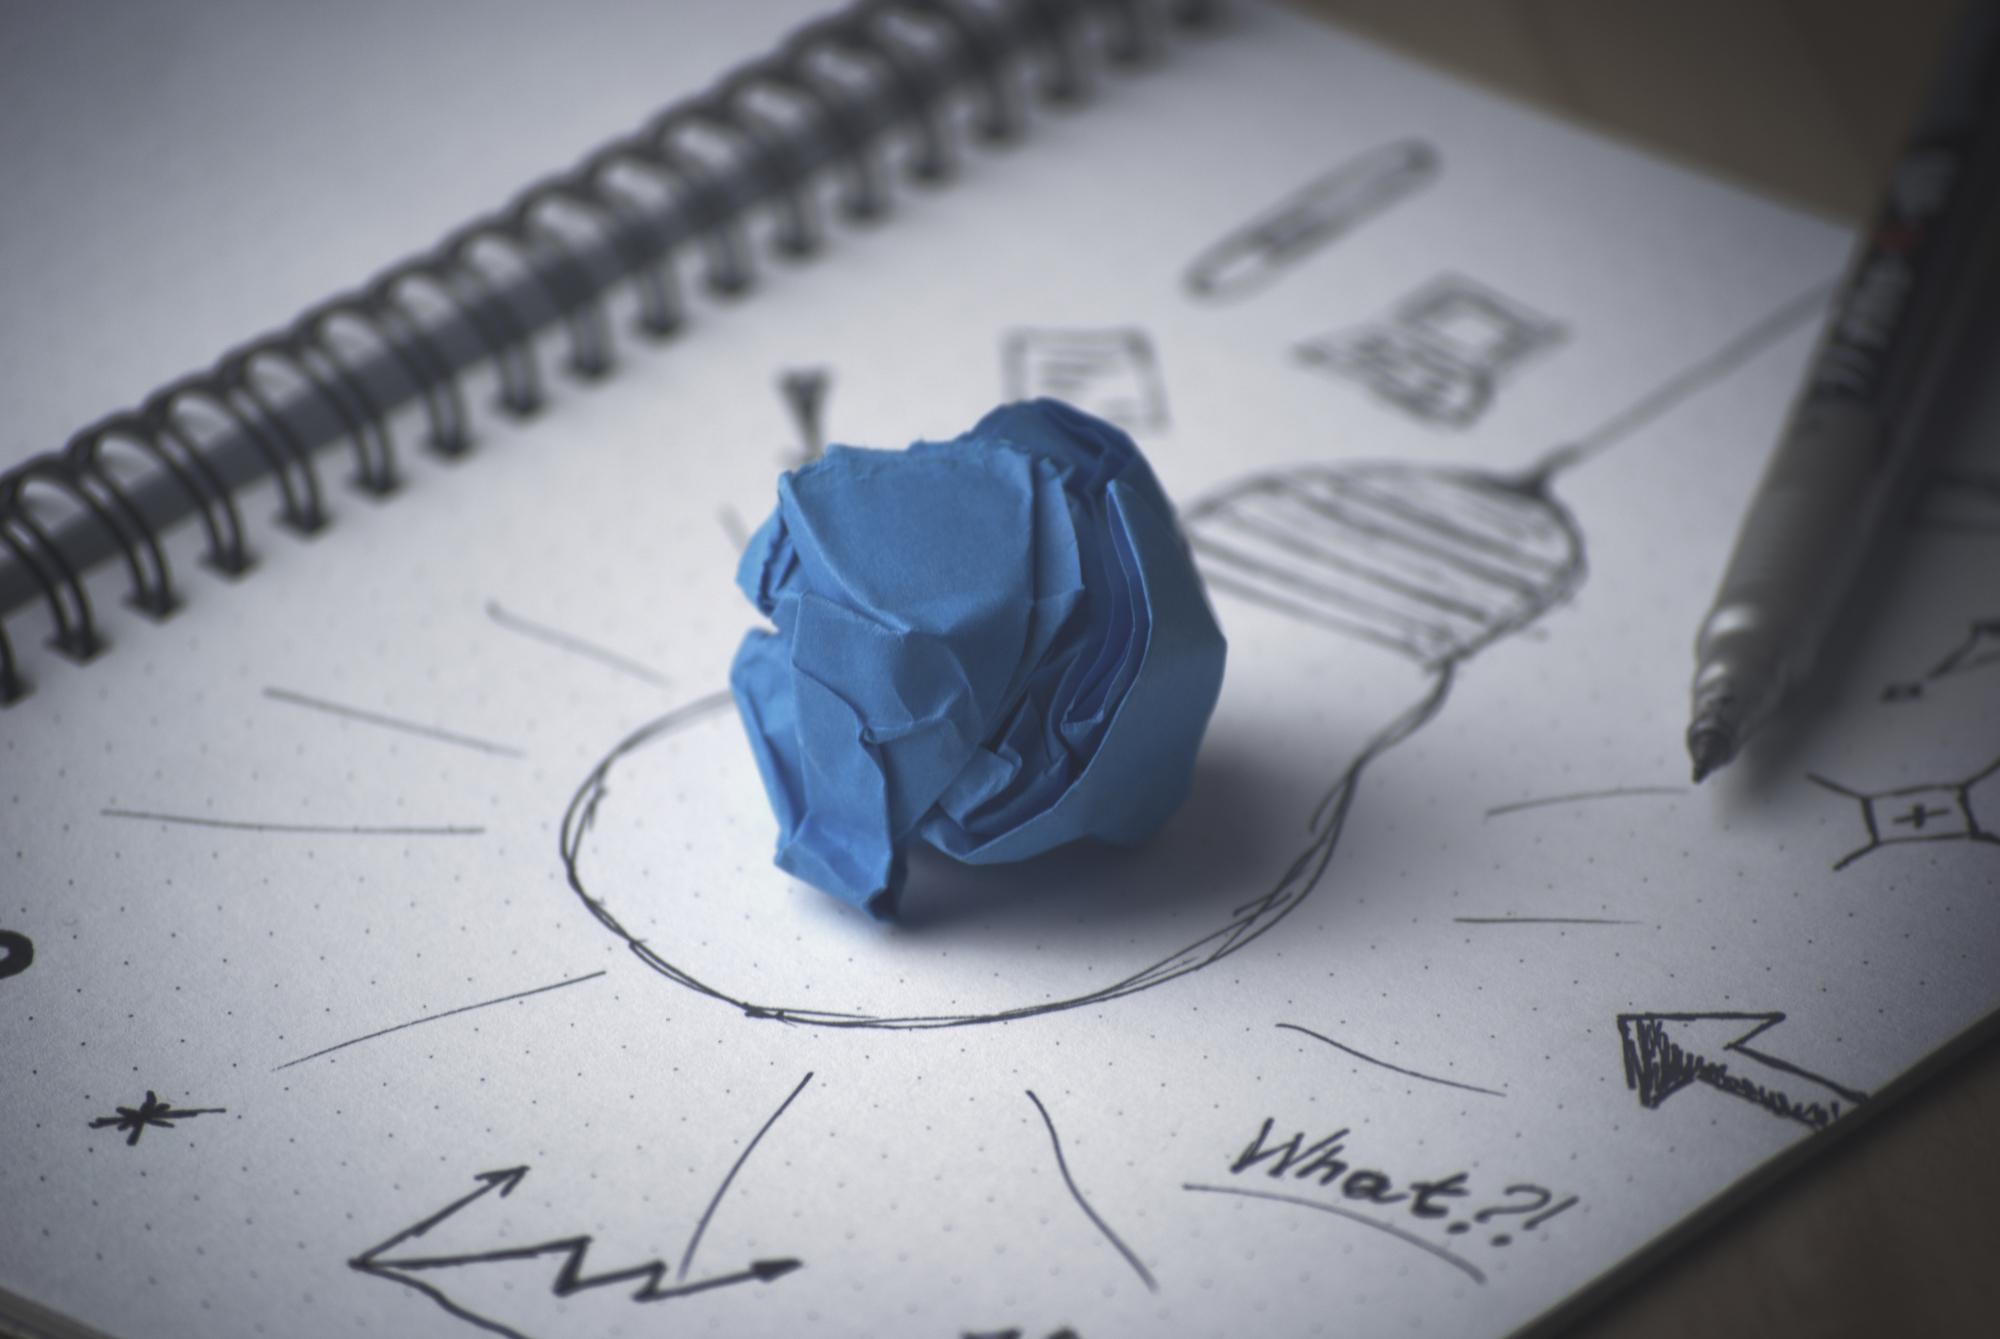 pen-idea-bulb-pape